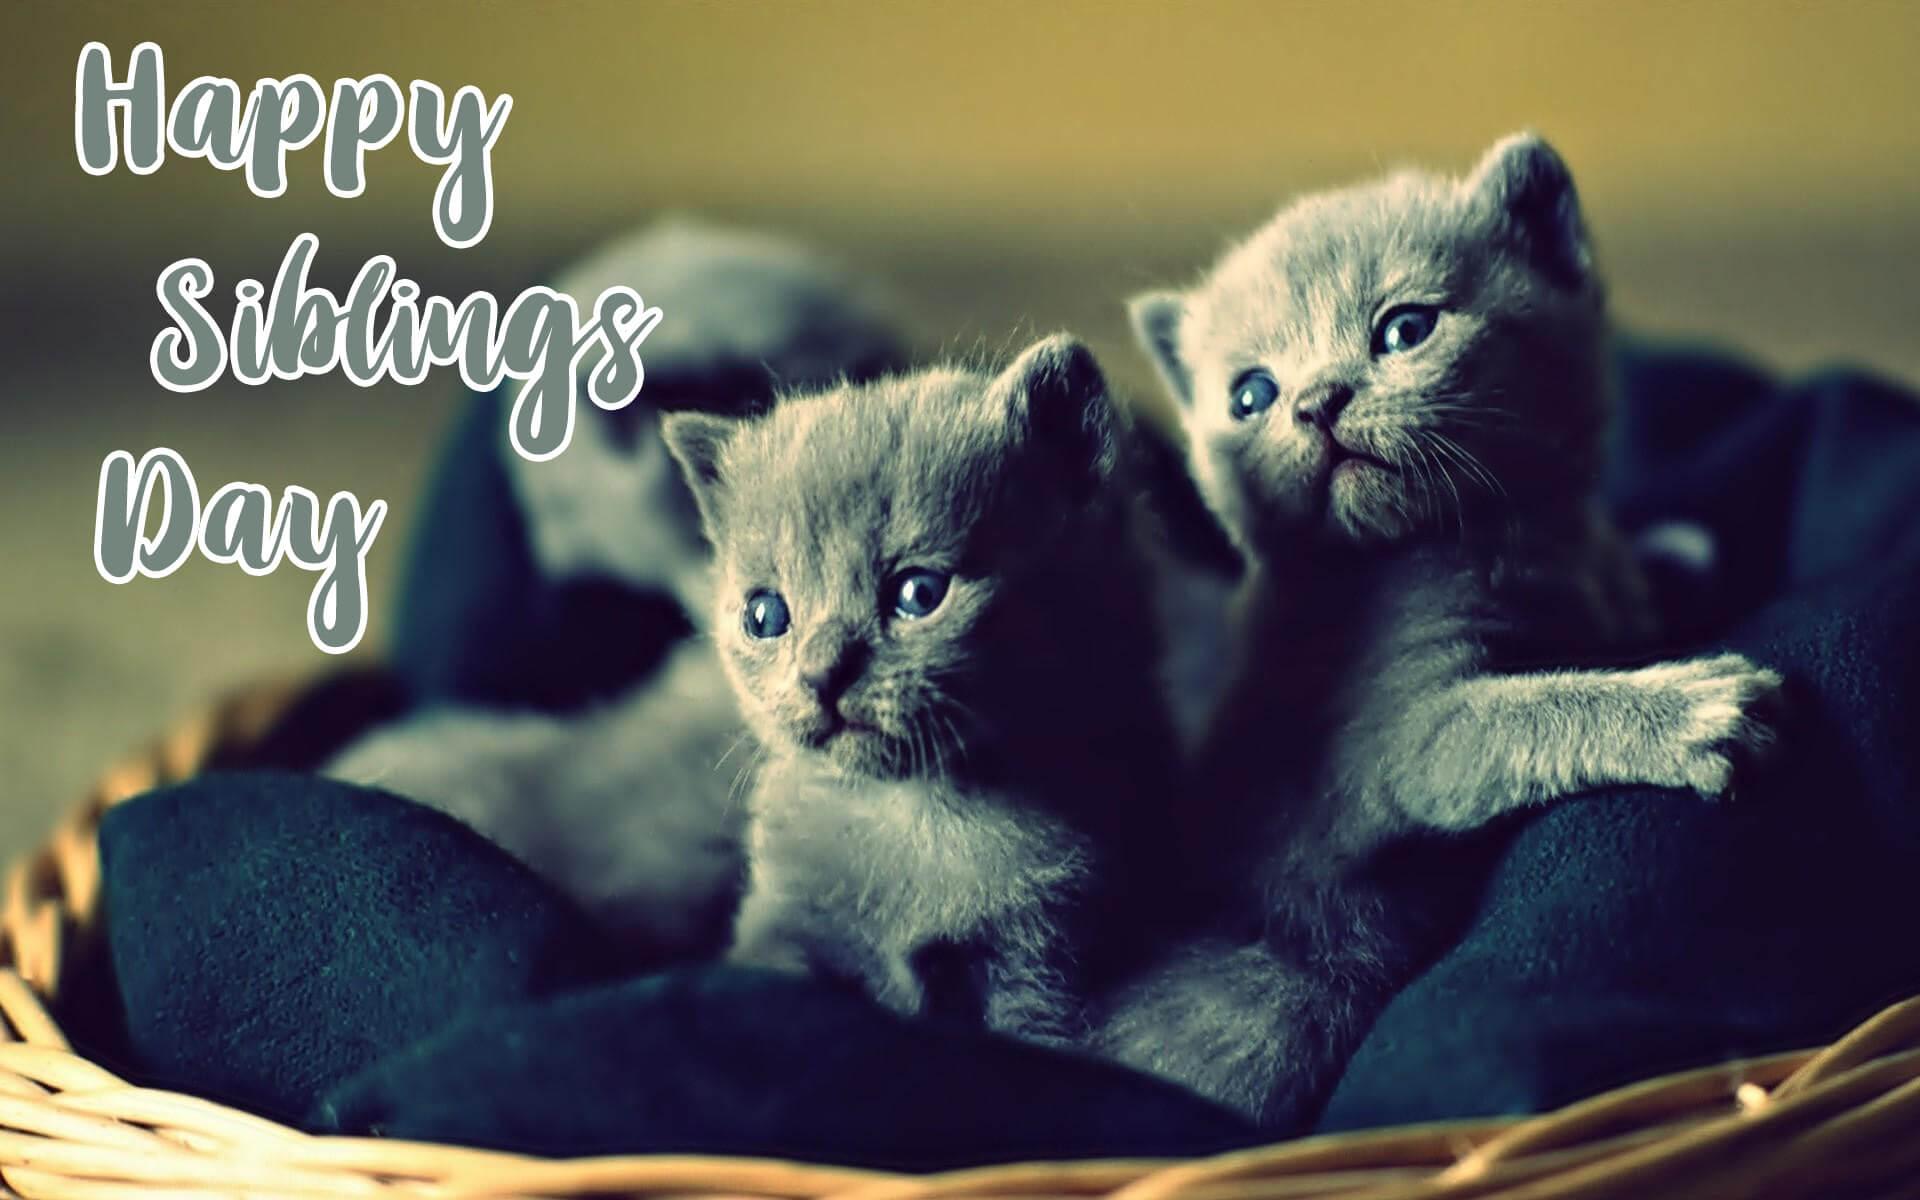 happy national siblings day two kittens cat in basket hd wallpaper